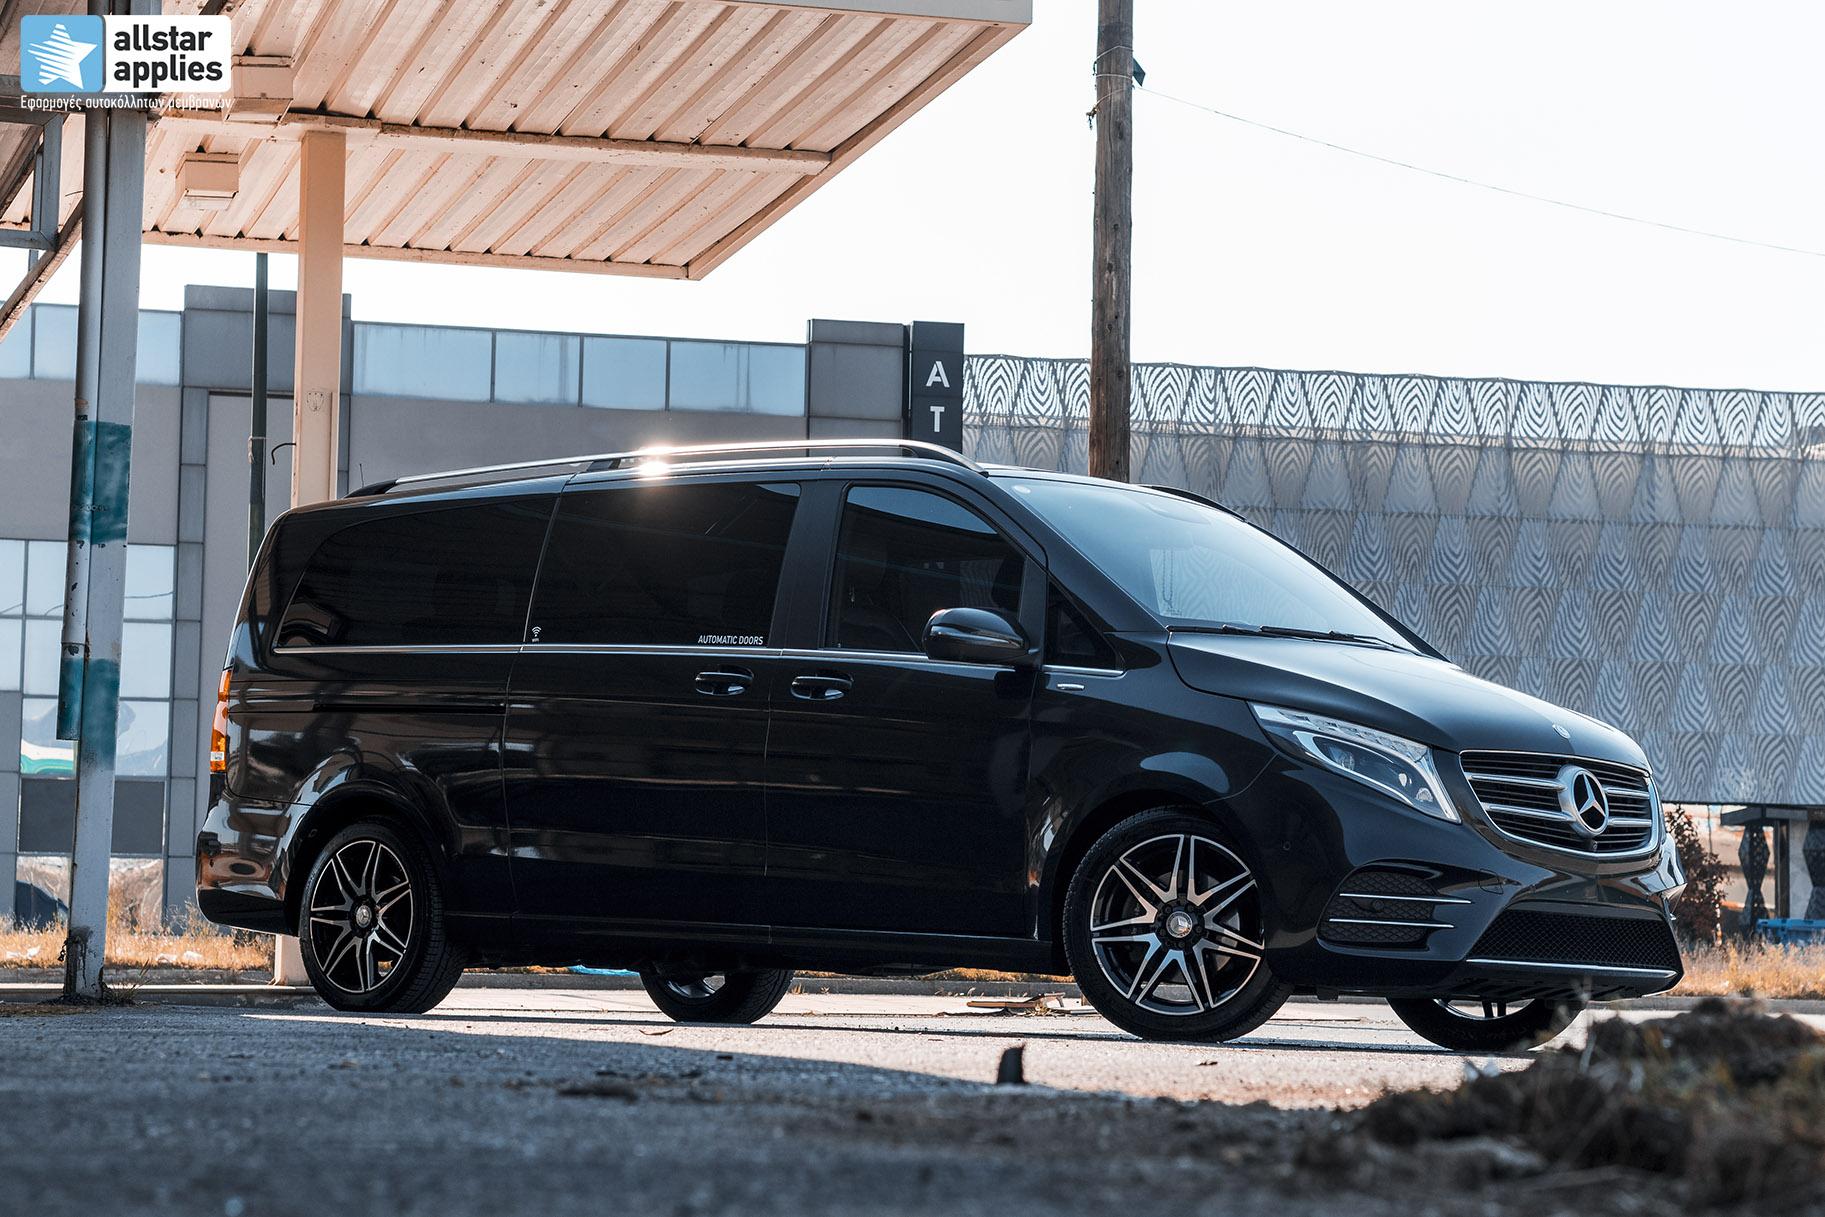 Car wrapping Θεσσαλονίκη Mercedes Benz Allstar Applies